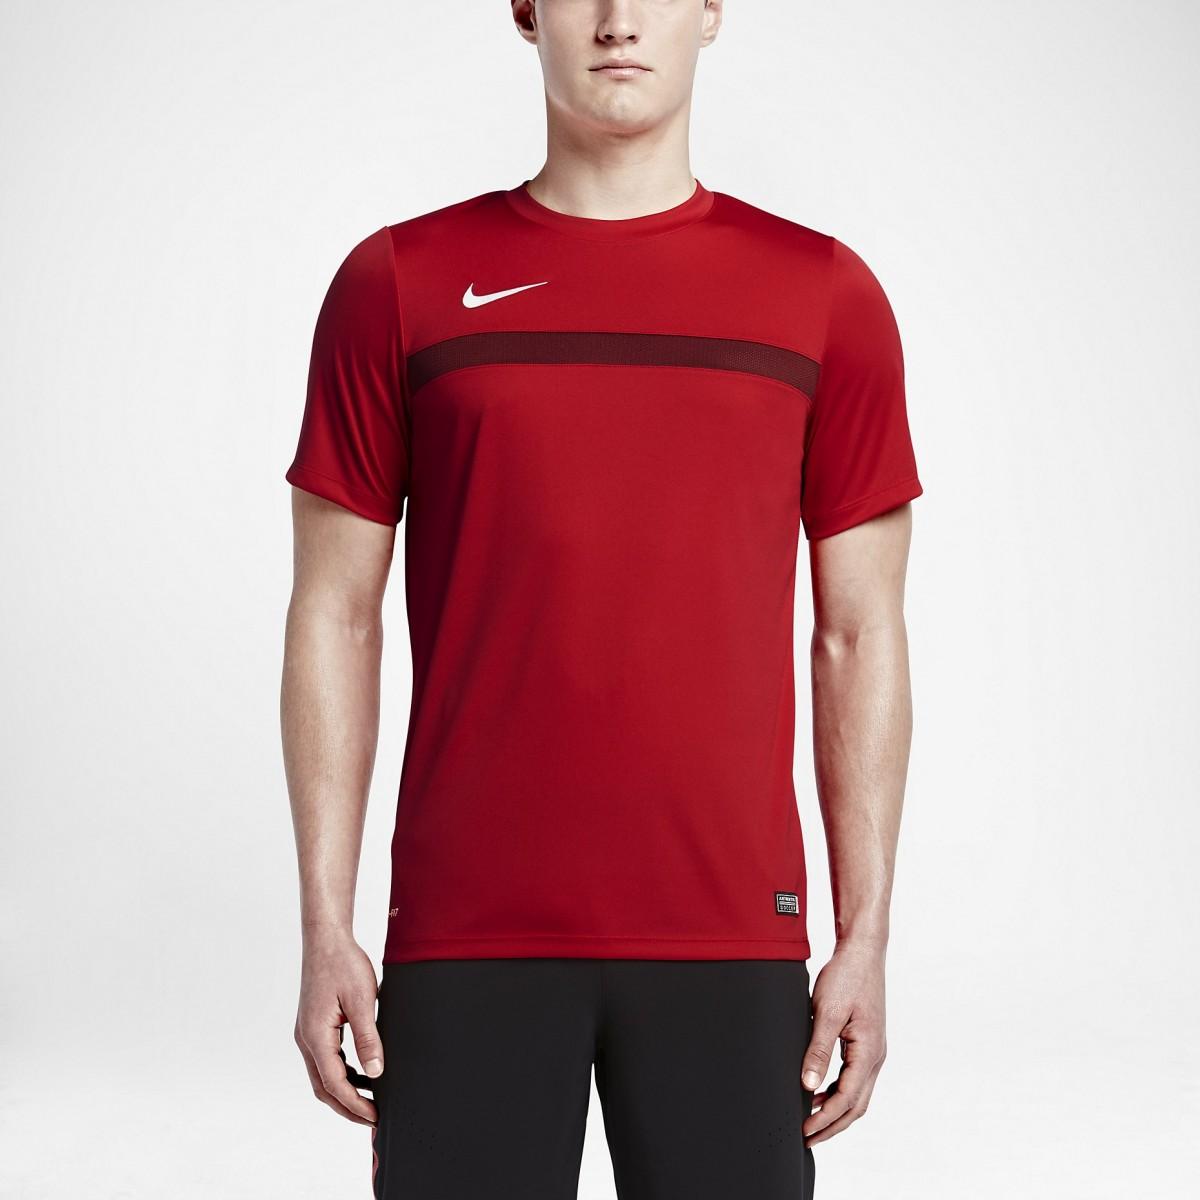 7fffdb5930811 Bizz Store - Camiseta de Futebol Masculina Nike Academy Training